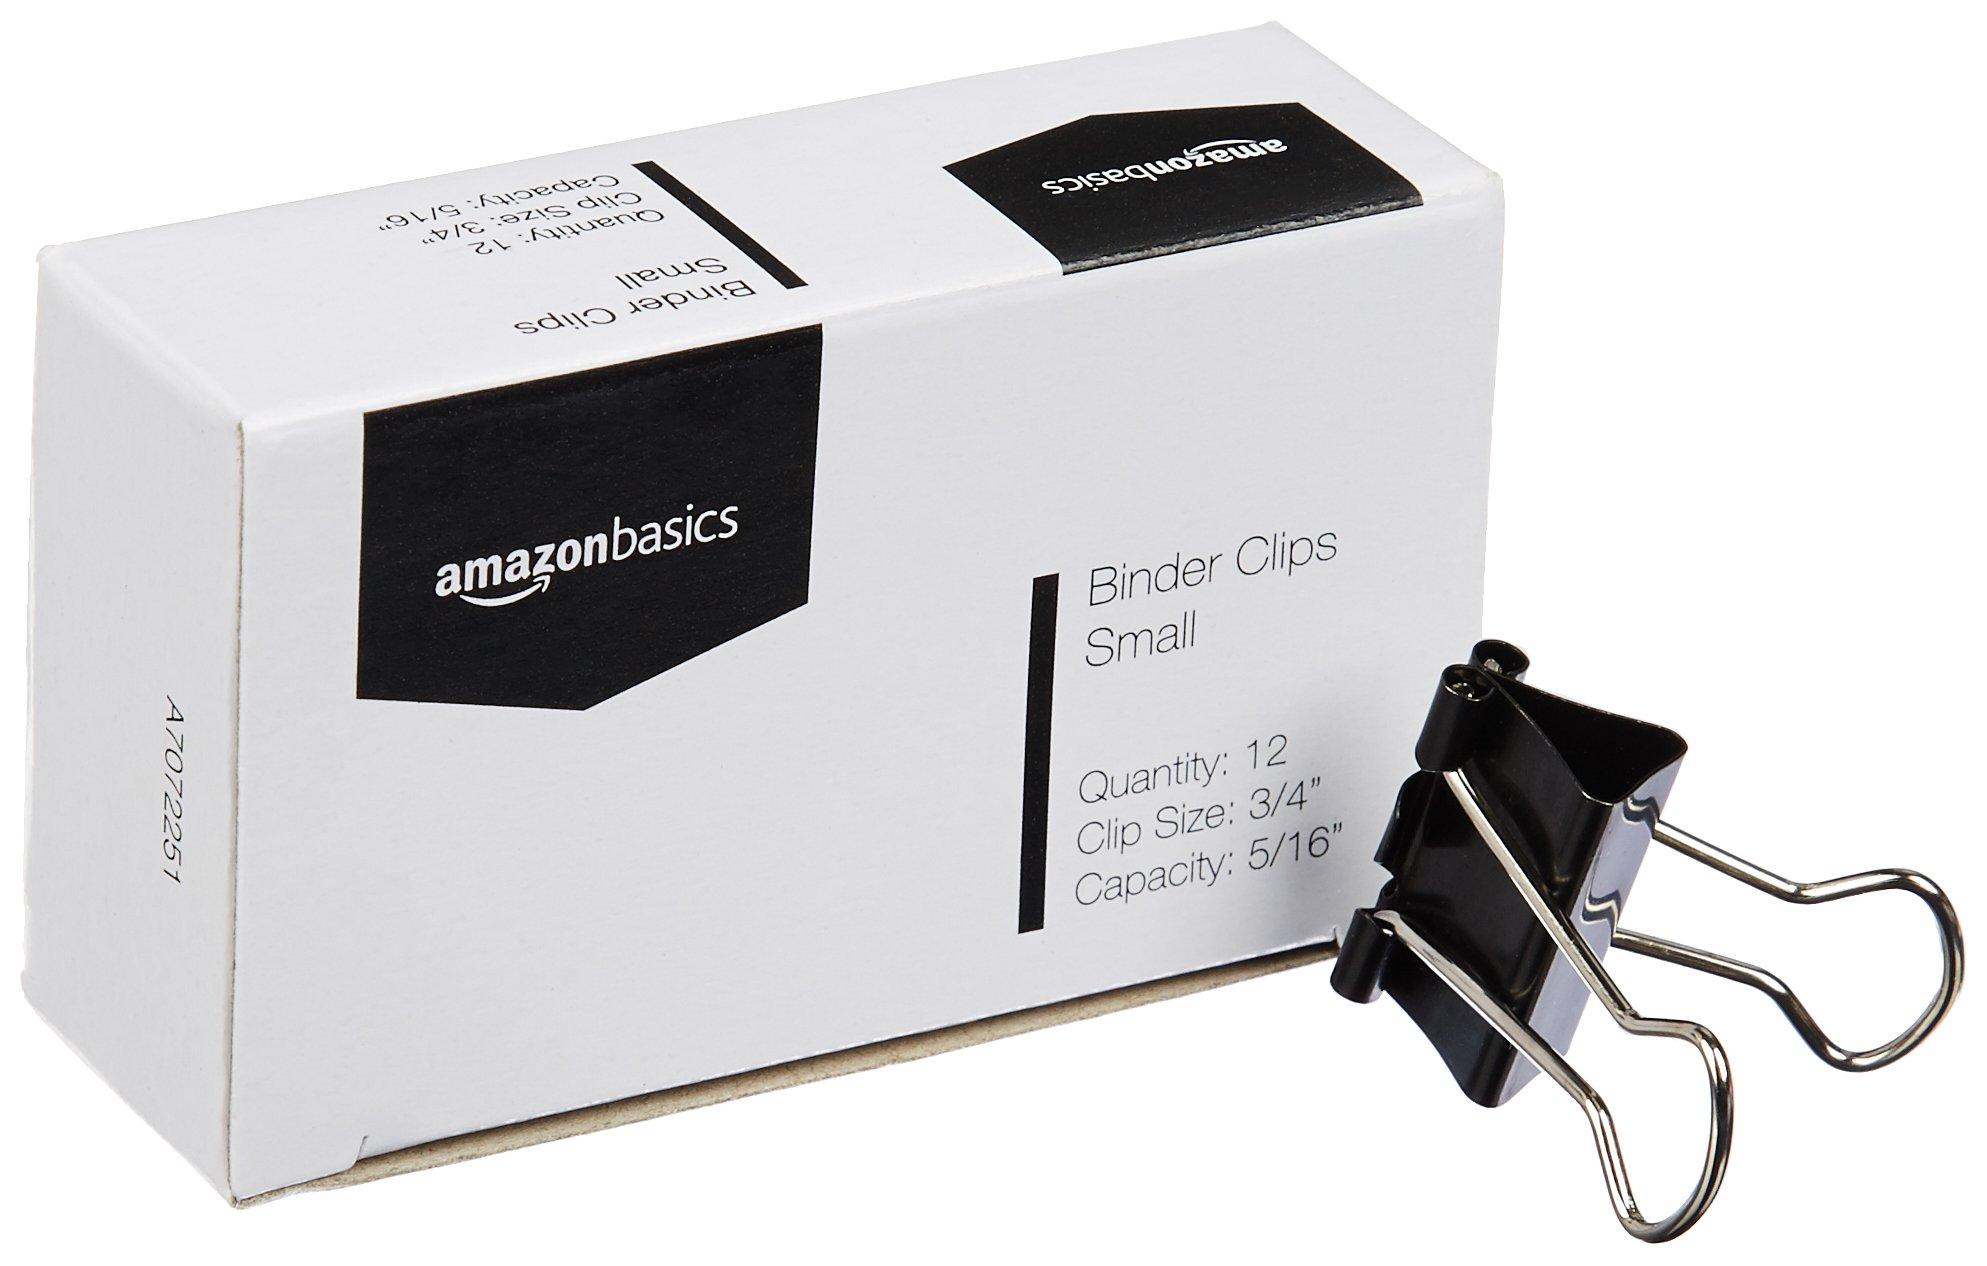 AmazonBasics Binder Clips - Small, 12 per Pack, 12-Pack